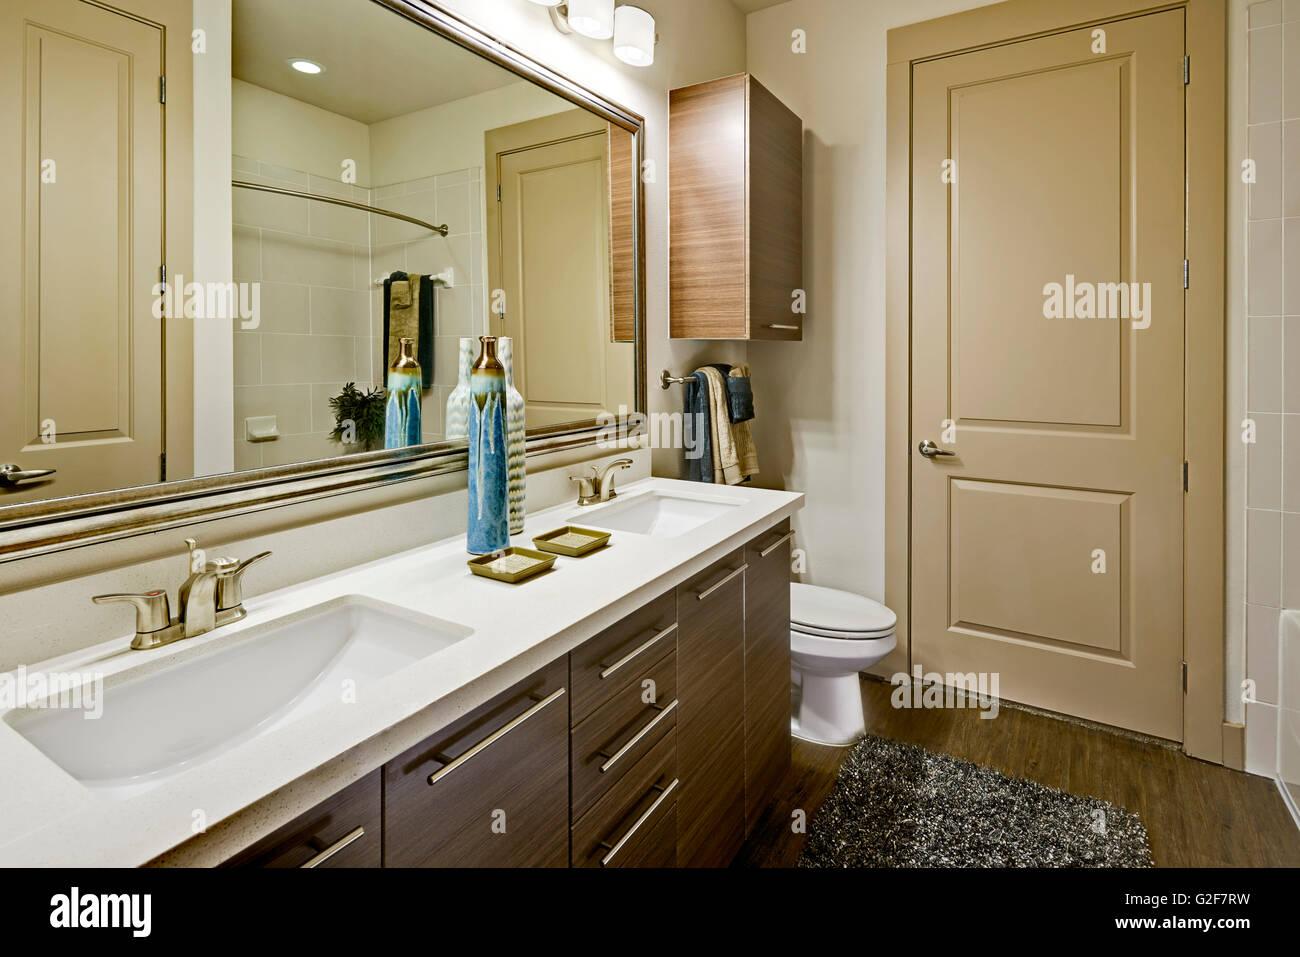 Small Bathroom - Stock Image